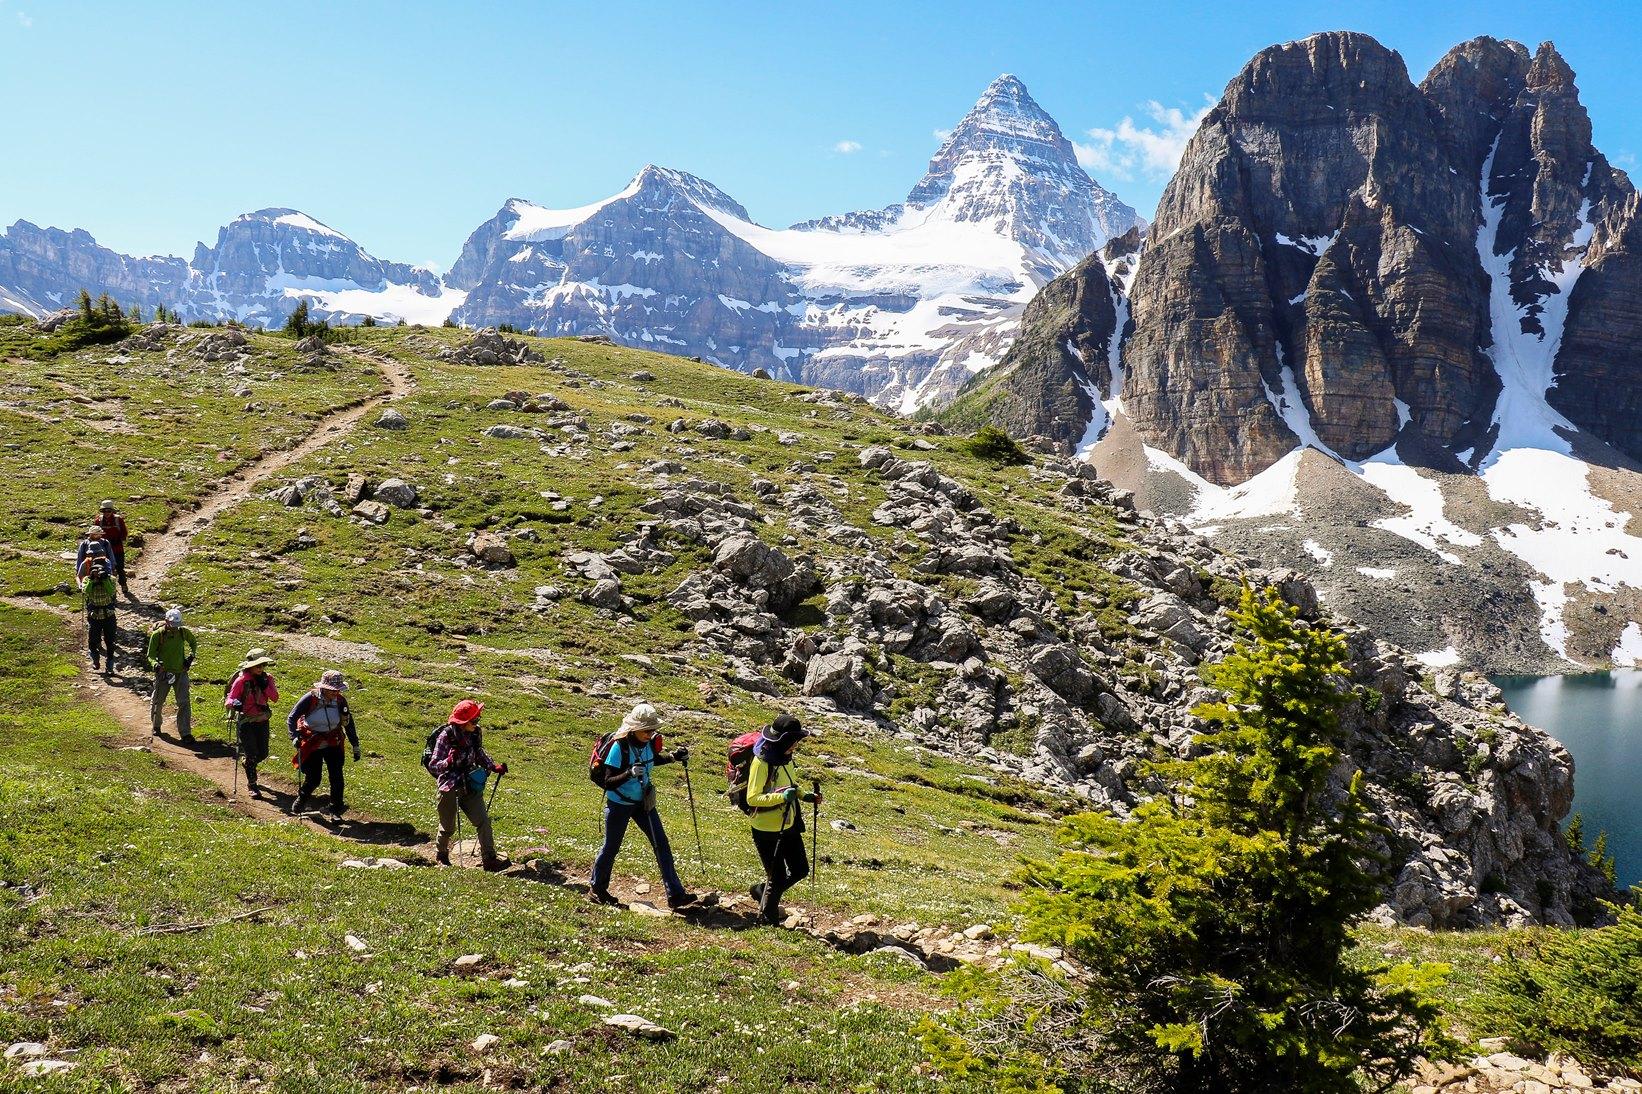 Mt.アシニボインの眺めを堪能しながら大自然の中を歩く